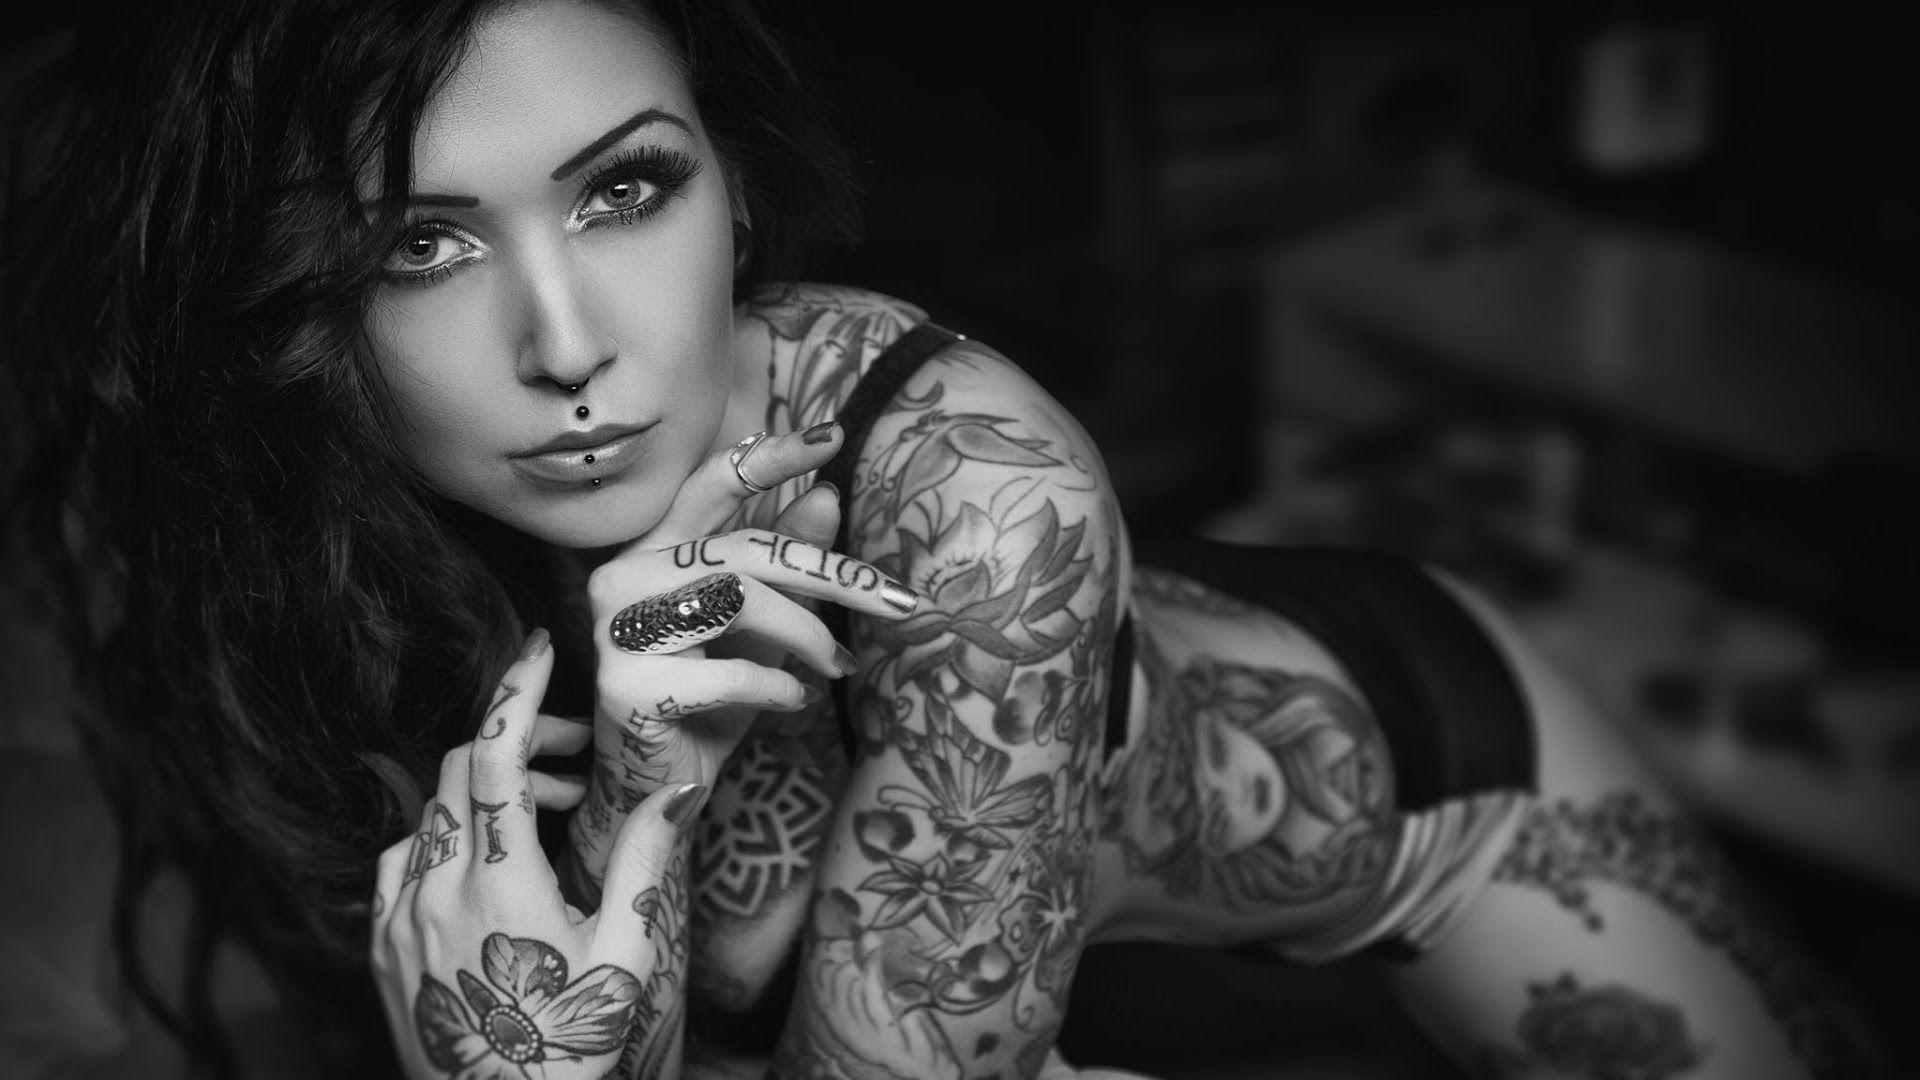 Hot tattooed girl wallpaper